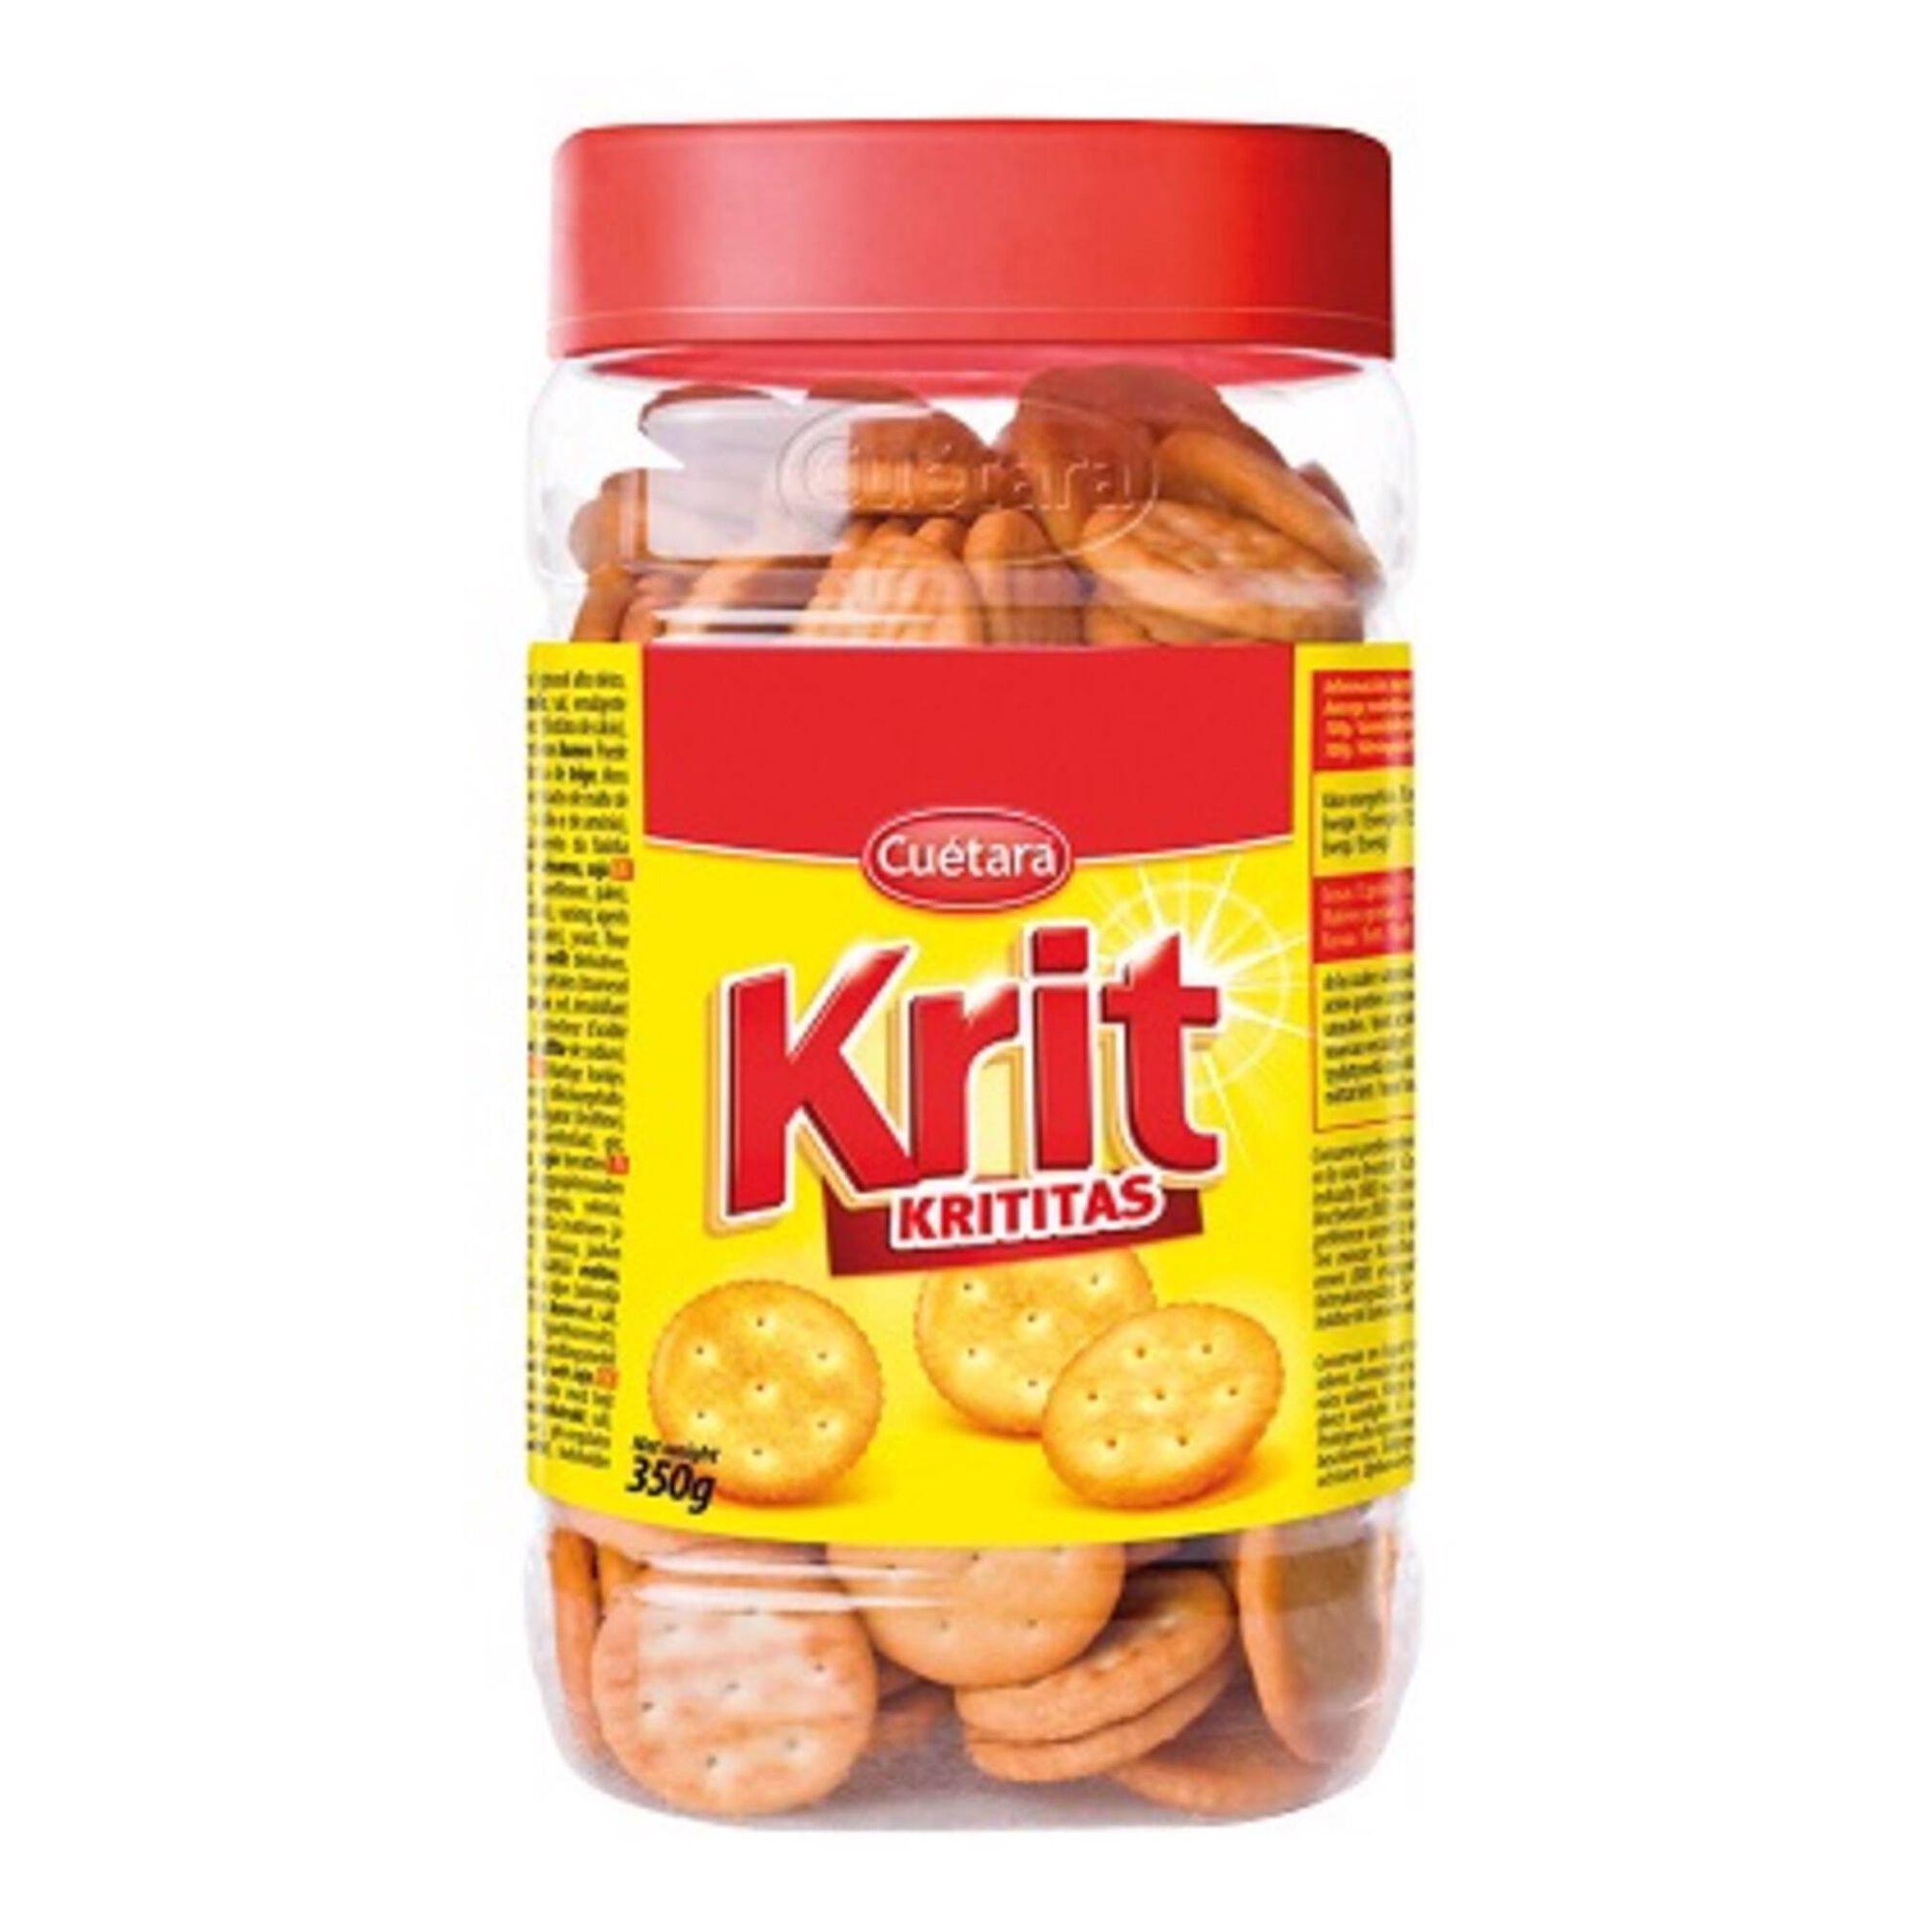 Snacks Bolachas Krititas Krit